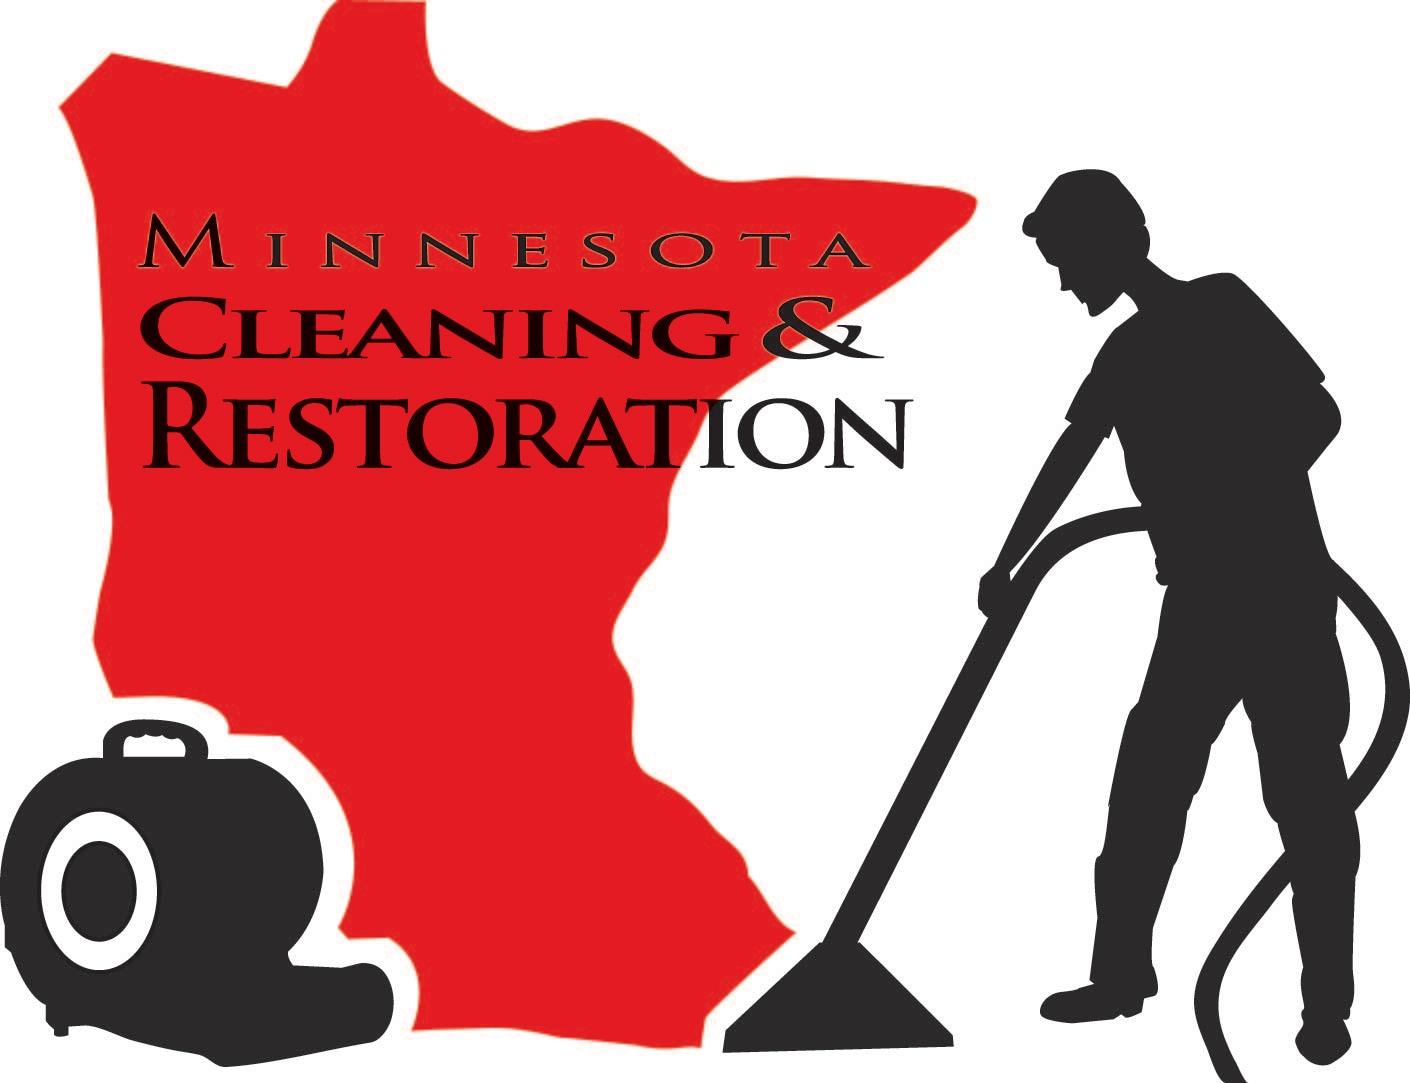 Minnesota Cleaning & Restoration logo